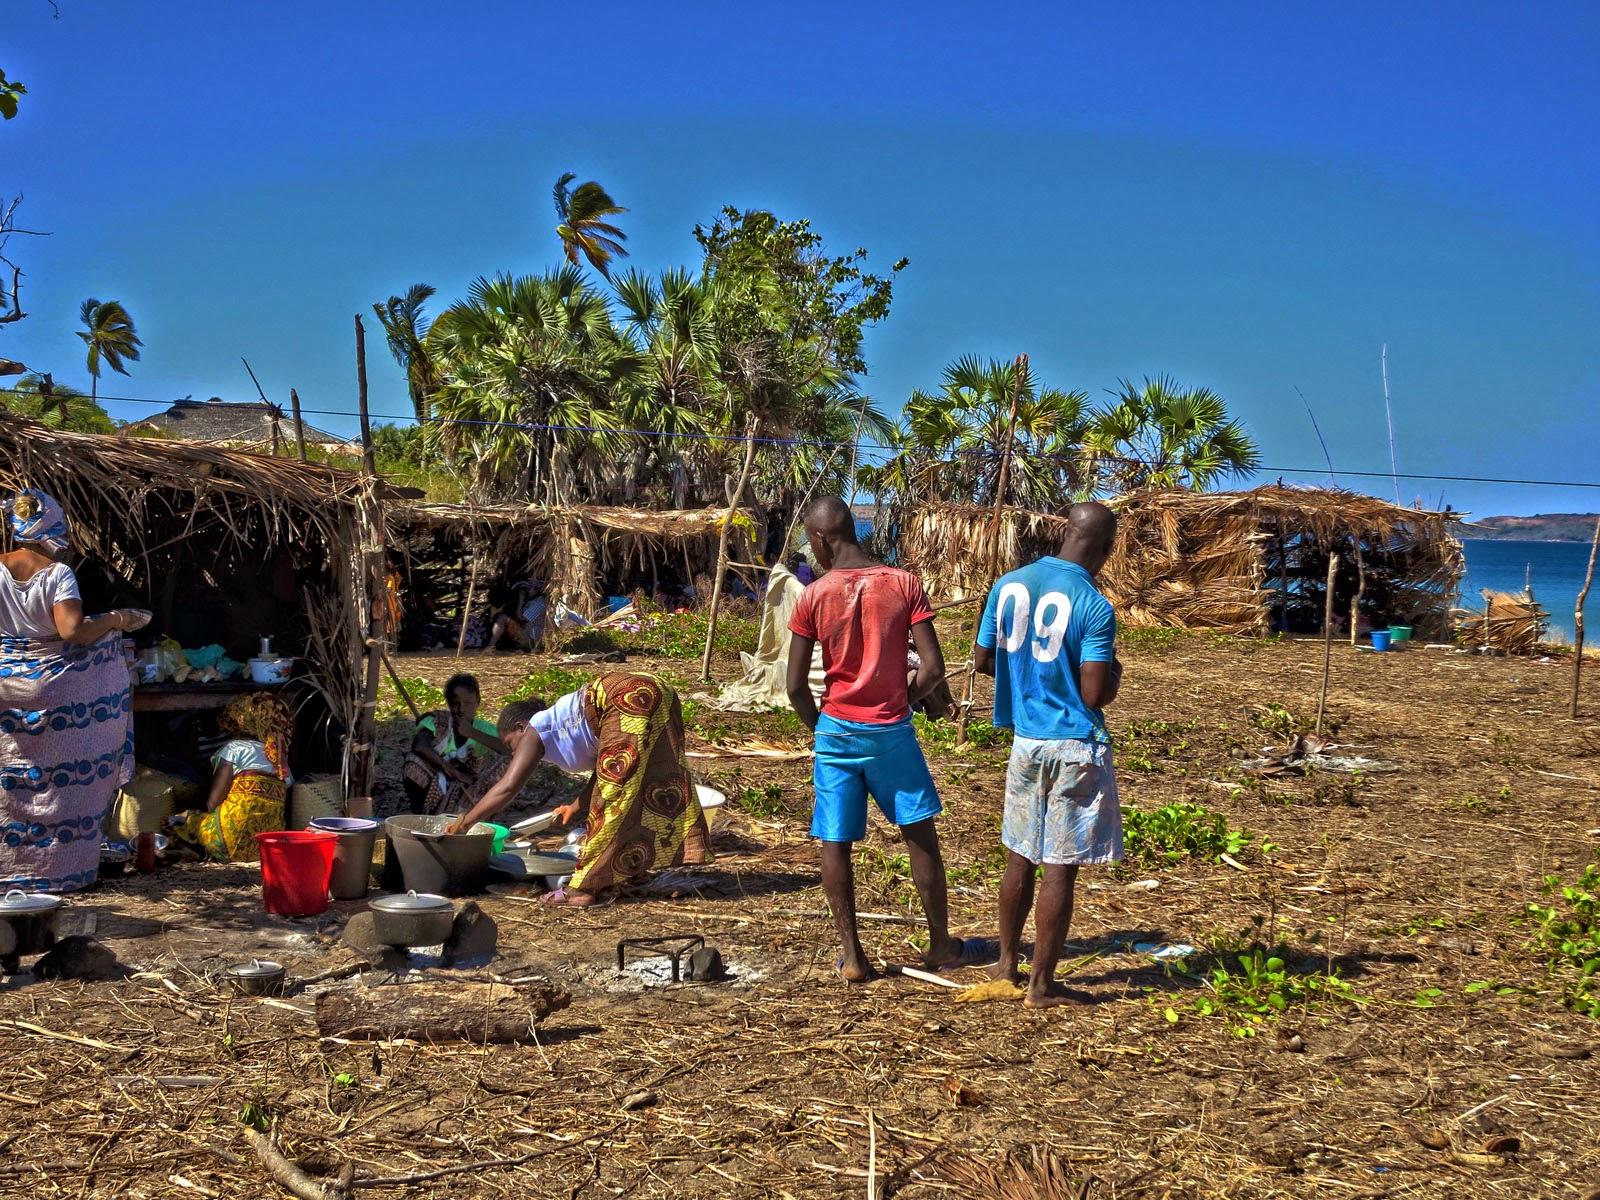 Madagascar8 - 009.jpg